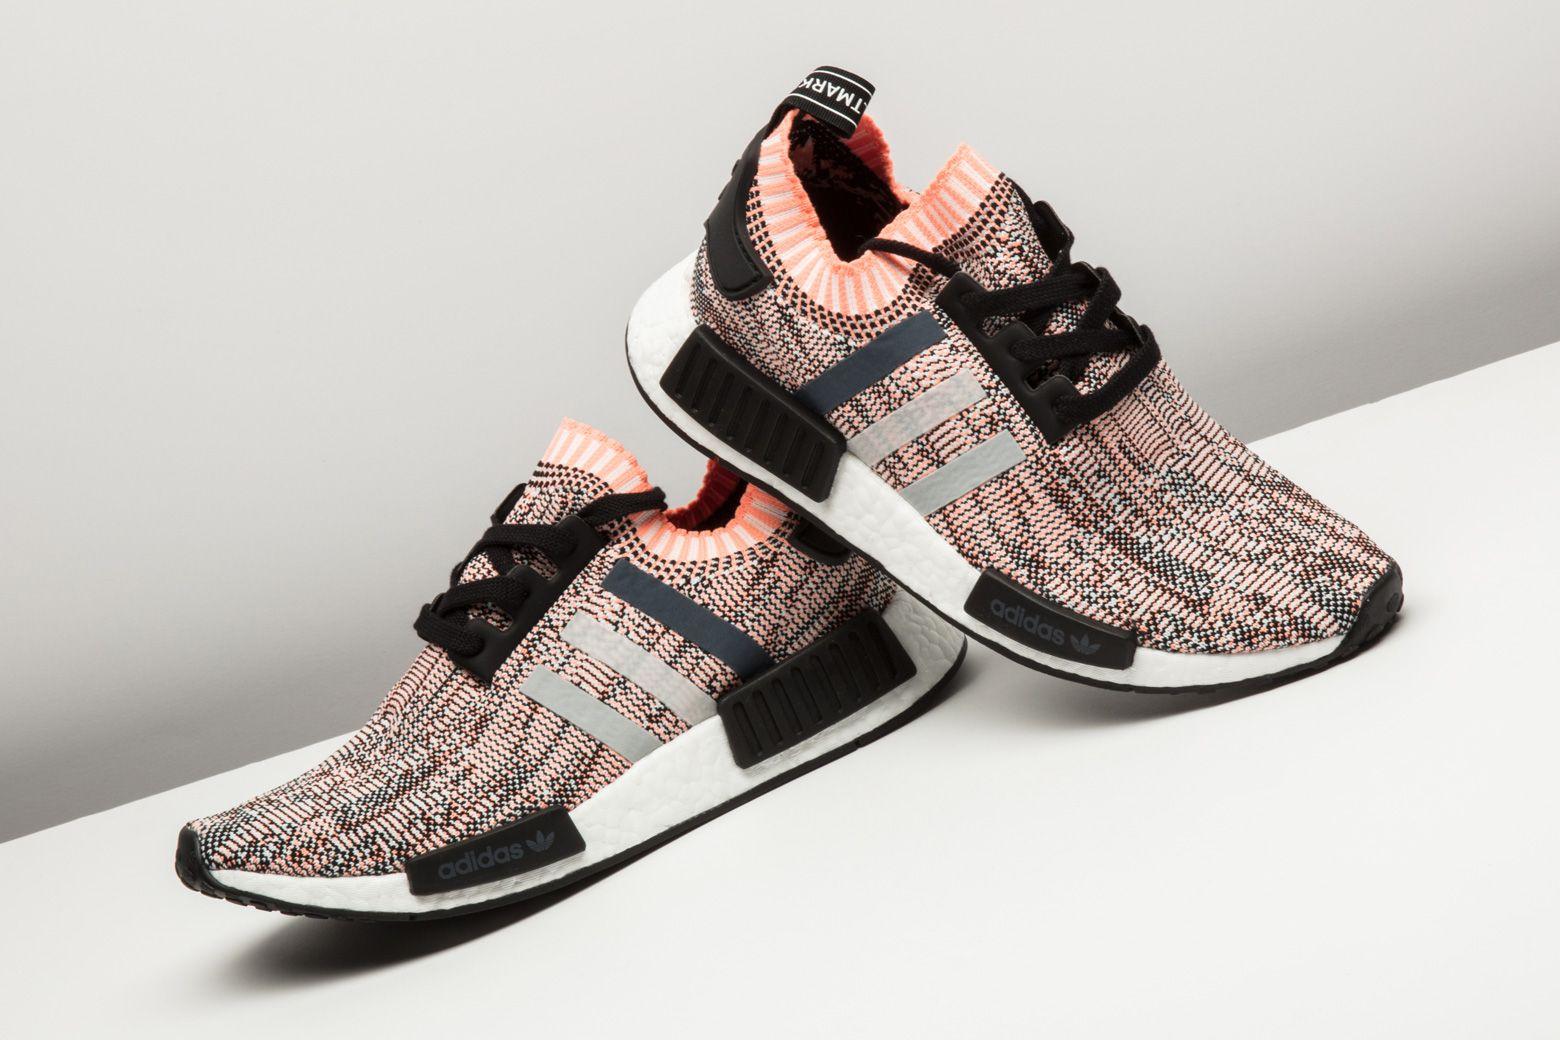 hot sale online d1a48 055c1 Adidas NMD_R1 Womens PK - BB2361   adidas NMD   Fashion ...